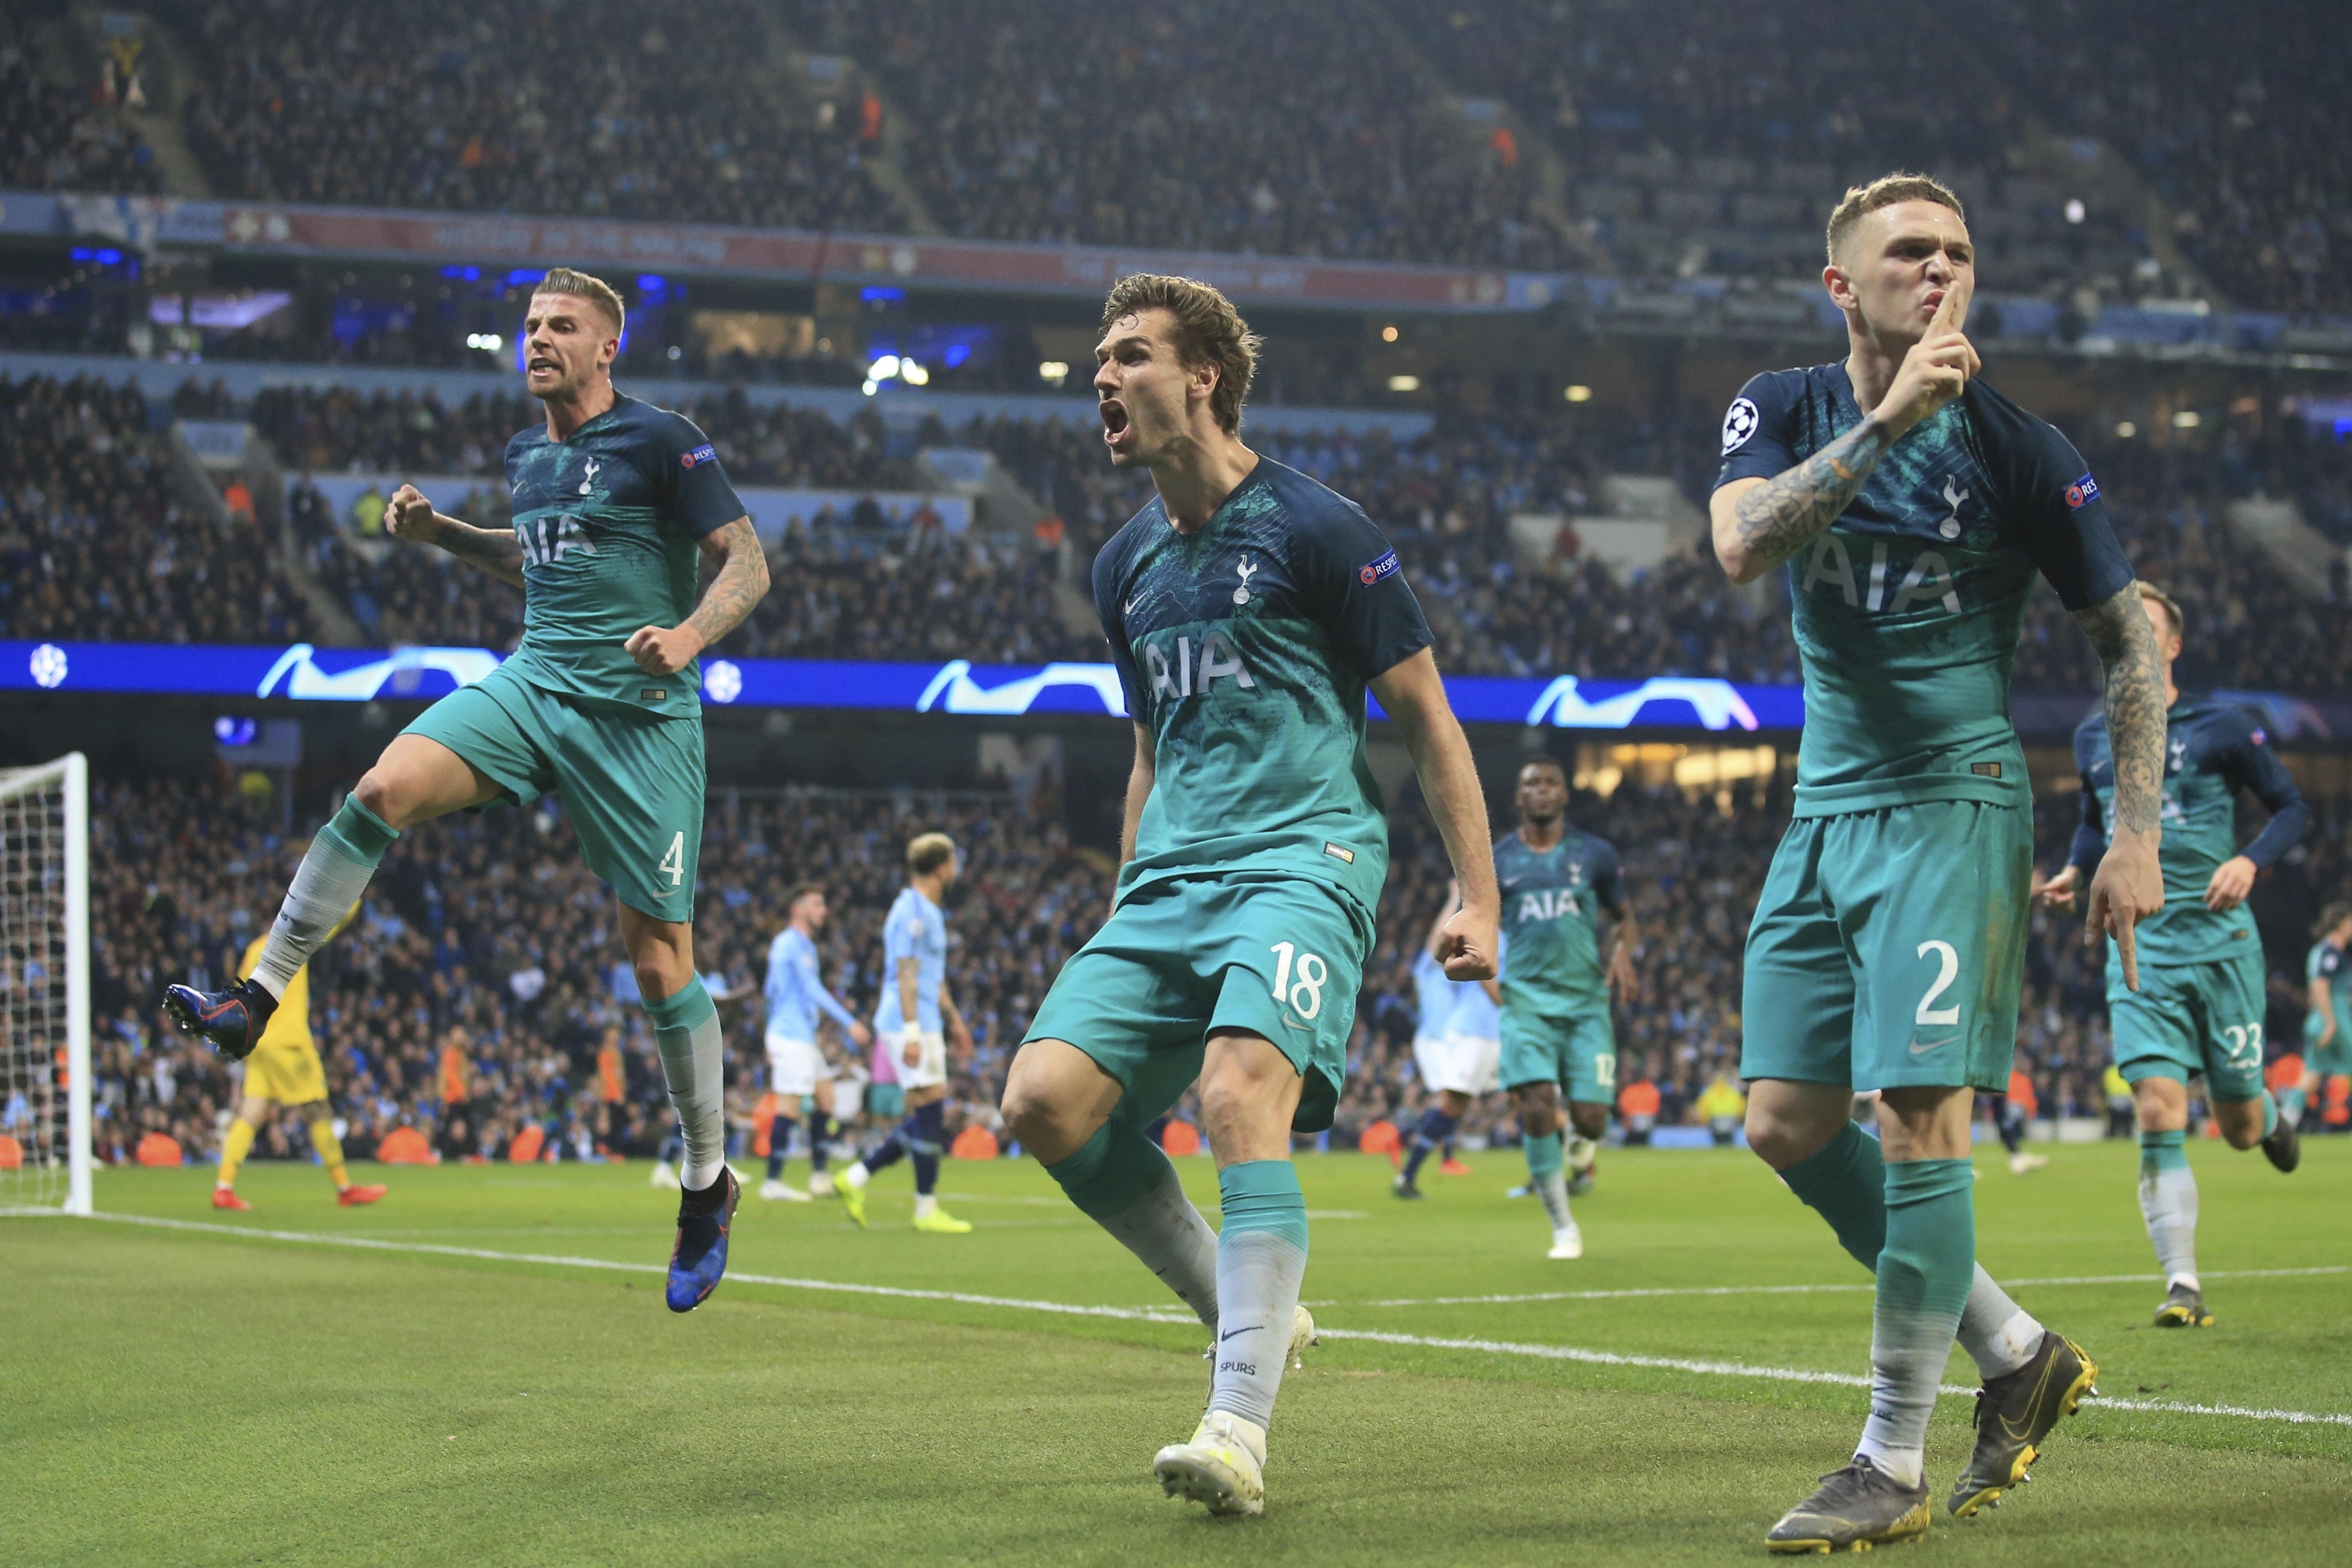 Var Decision Lifts Tottenham Past Man City In Champions League Quarterfinal The Washington Post